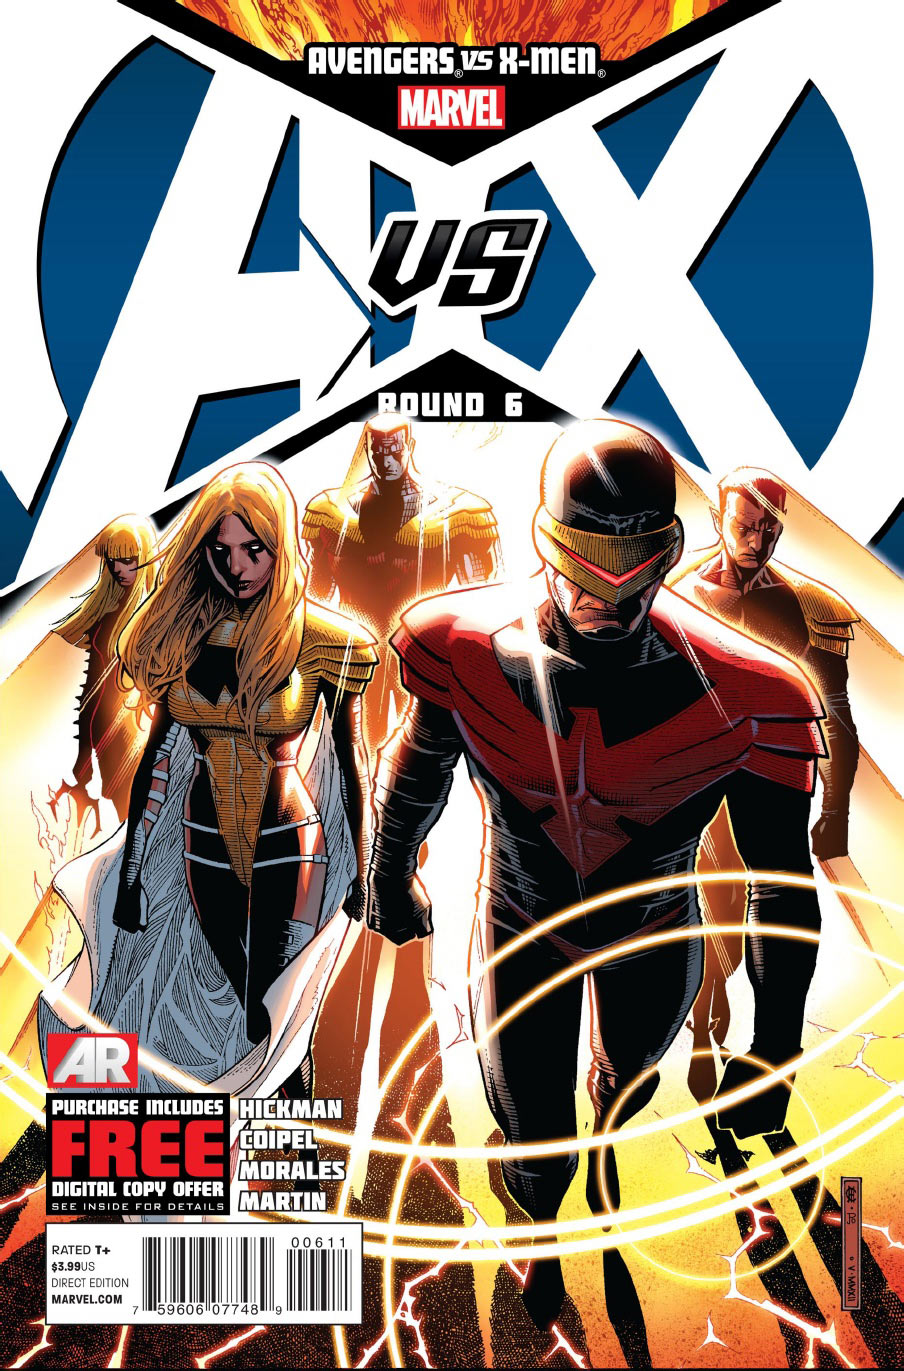 Avengers vs. X-Men Vol 1 6  Marvel Database  Fandom powered by Wikia